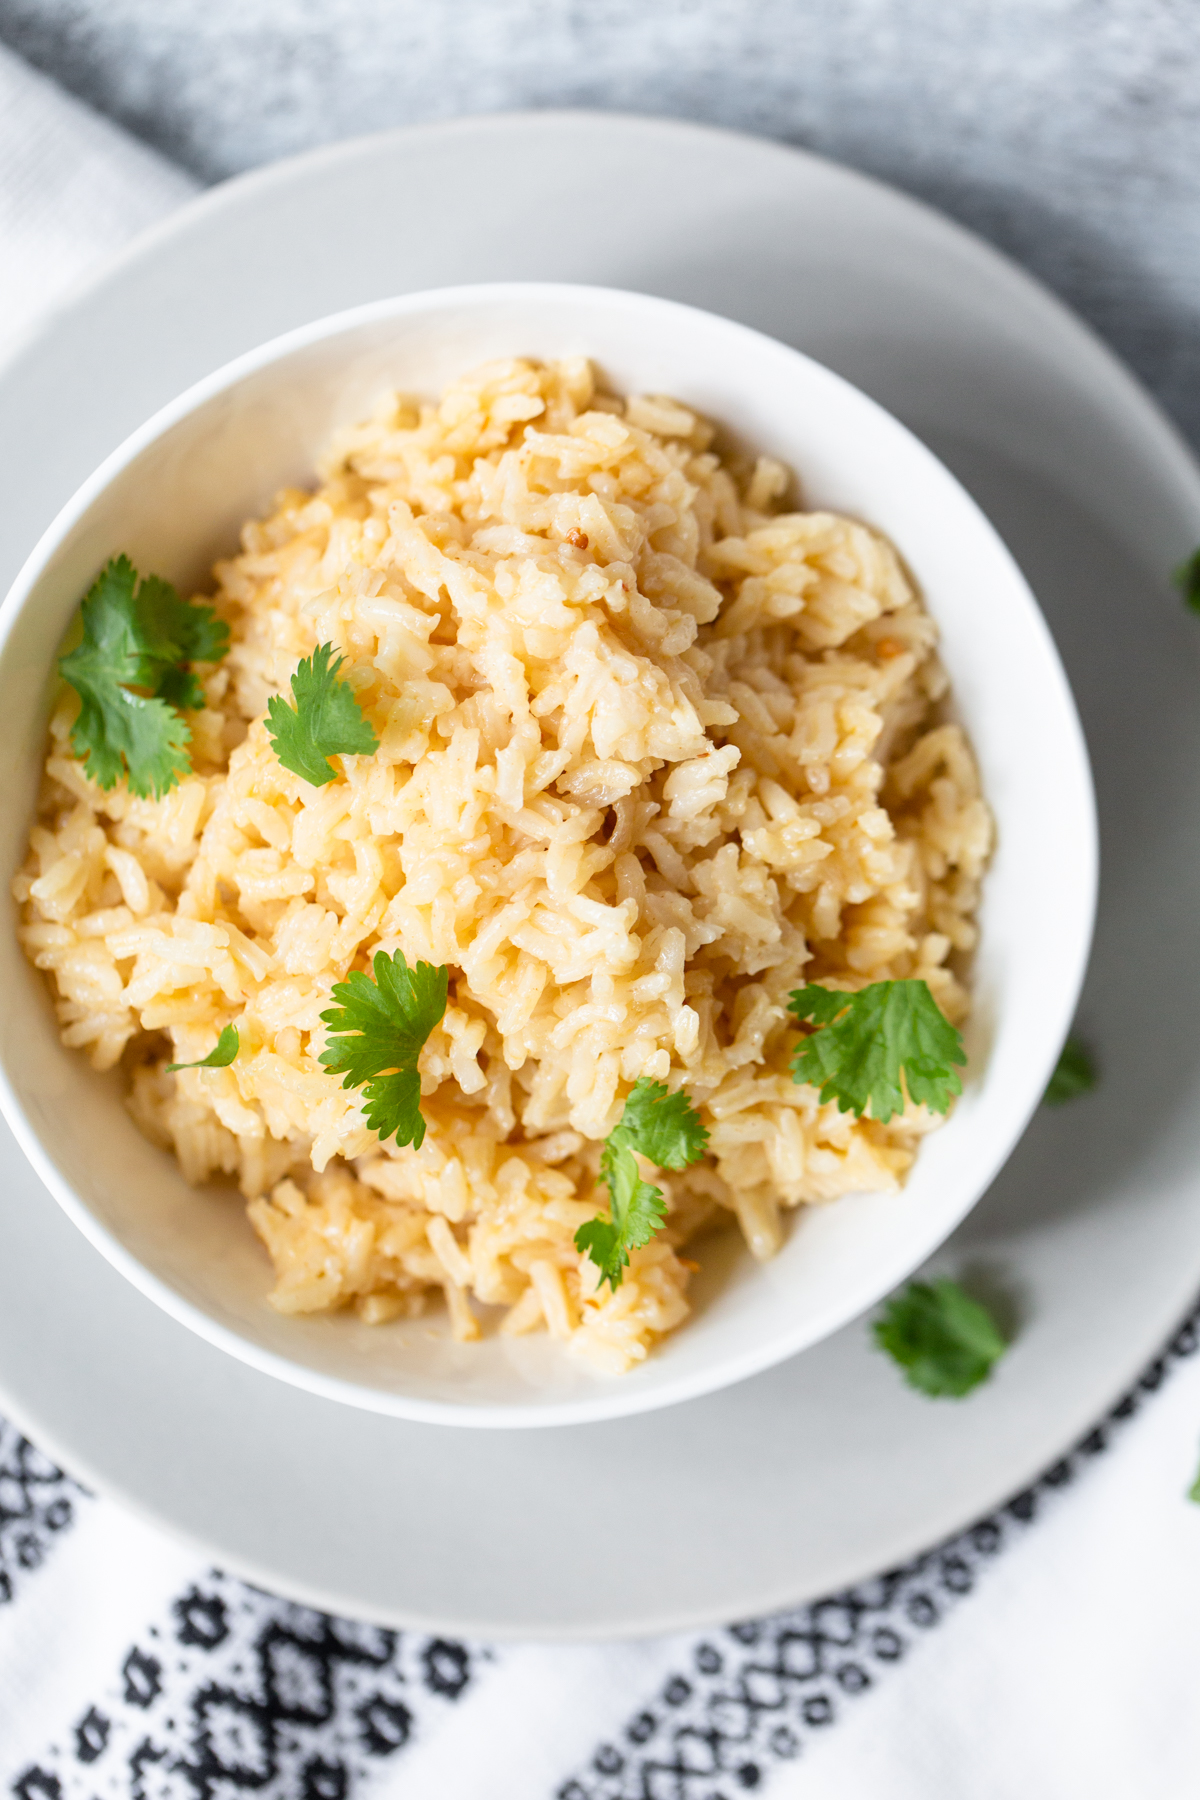 peri-peri rice from above